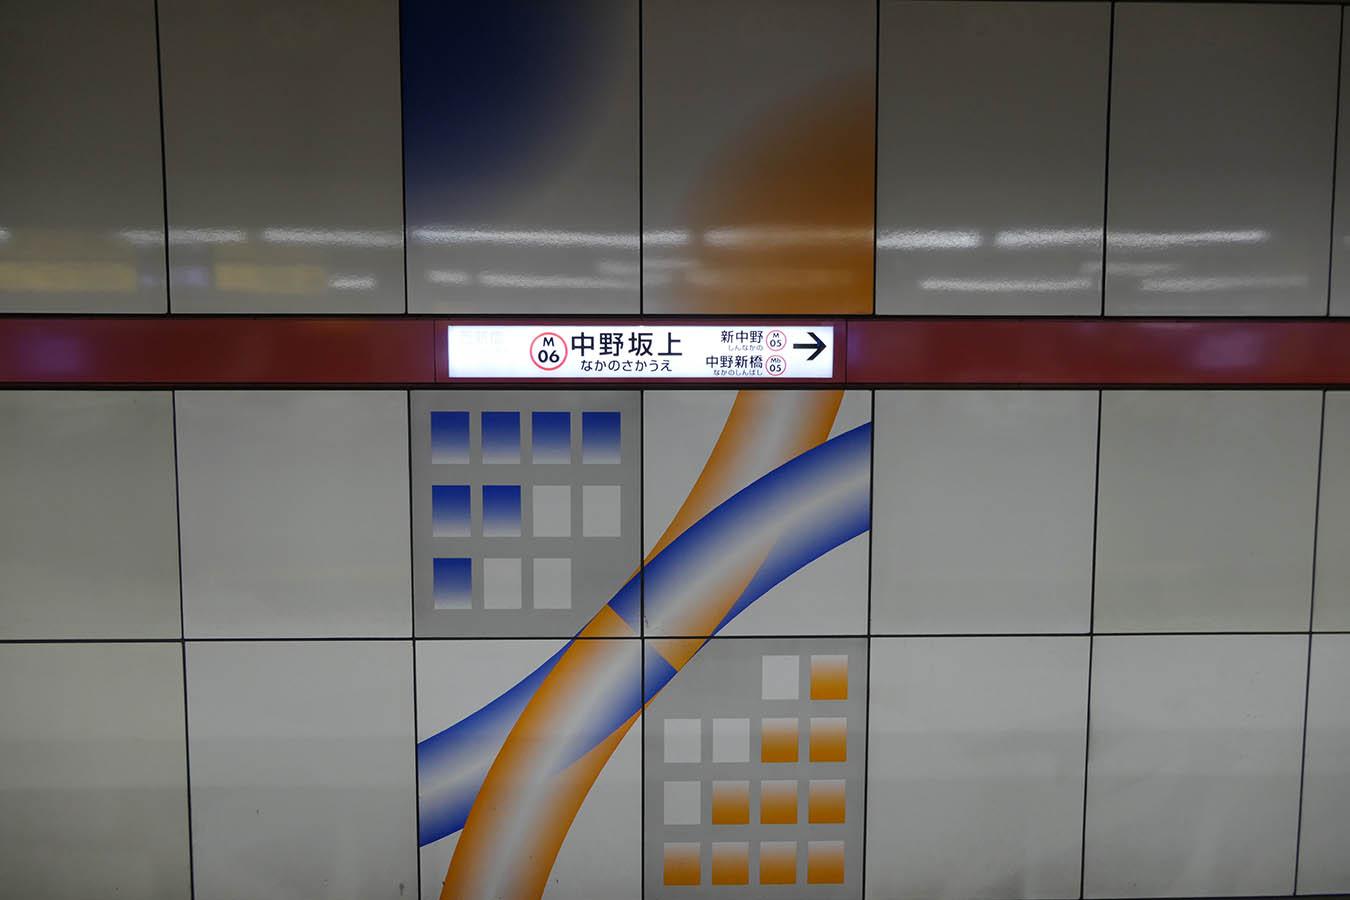 M06_photo07b.jpg